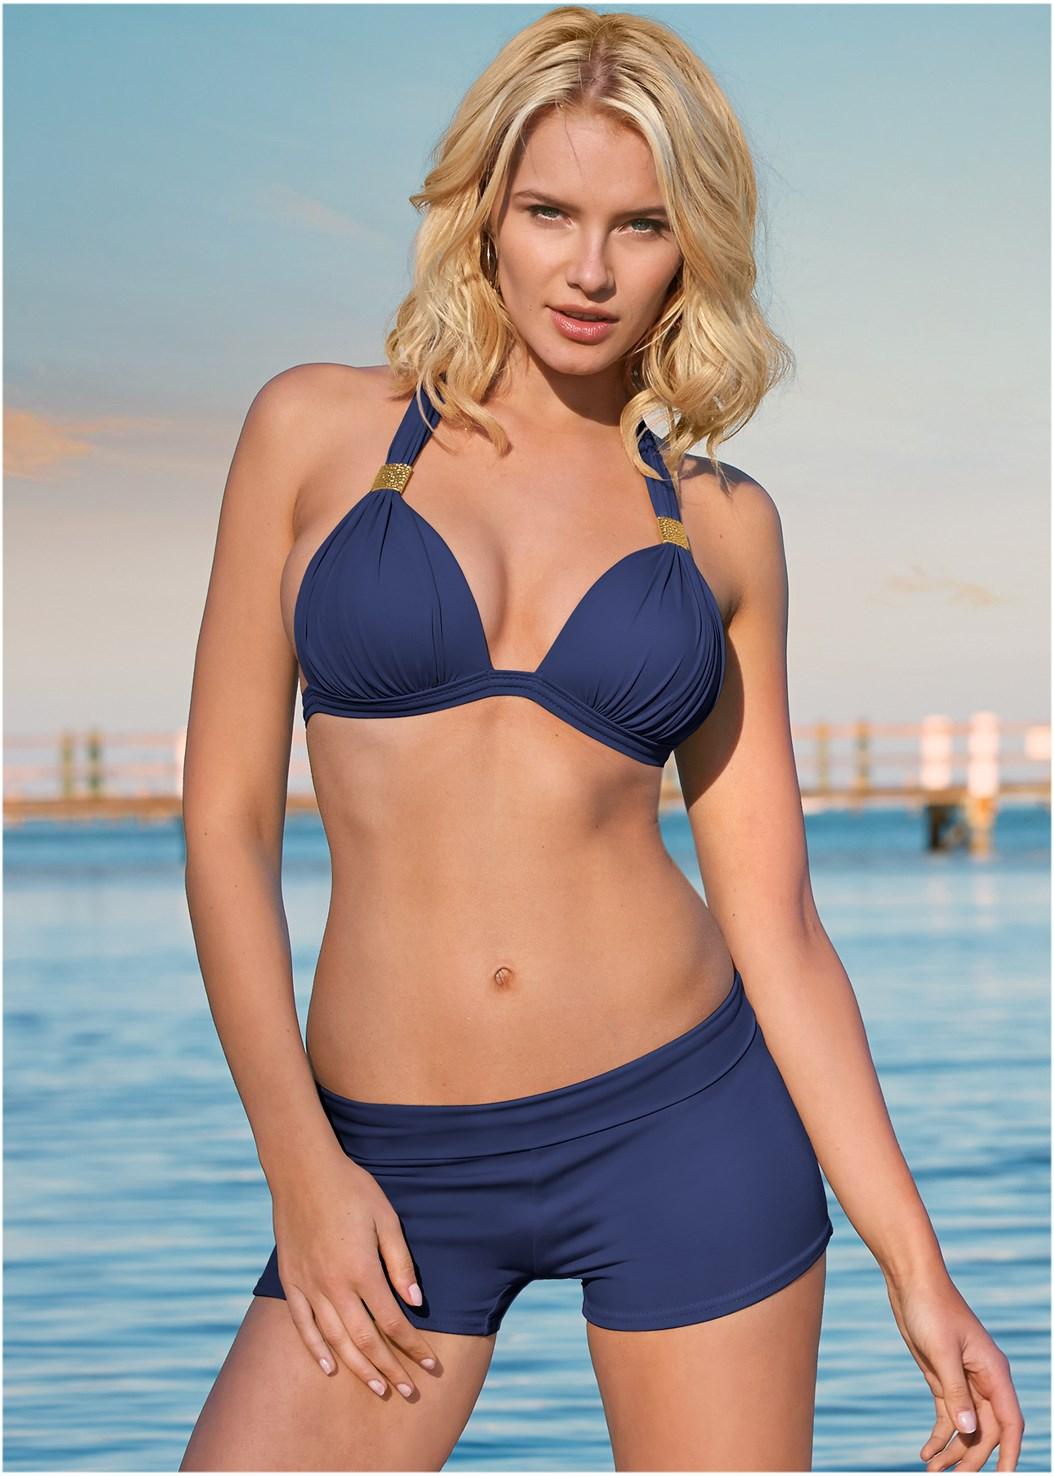 Goddess Enhancer Push Up Halter Top,Swim Short,Sheer Caftan Cover-Up